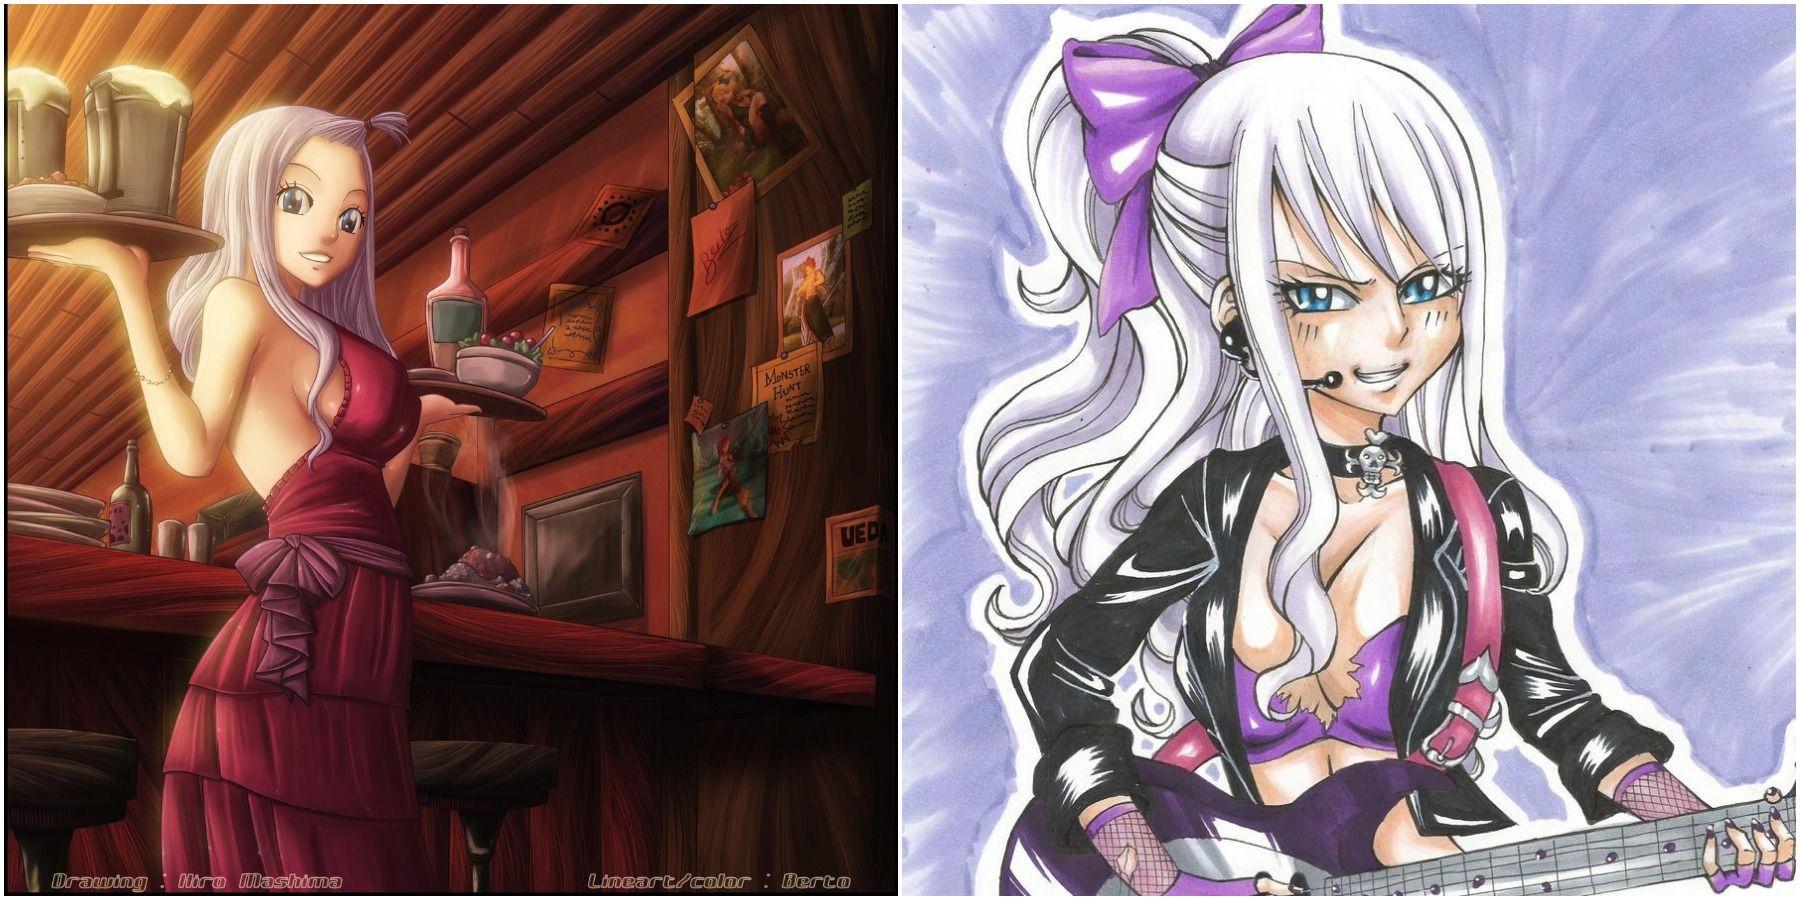 Fairy Tail 10 Lovely Fan Art Pictures Of Mirajane You Ll Like Mirajane satan soul mirajane cosplay style fashion moda stylus fasion trendy fashion la mode. fairy tail 10 lovely fan art pictures